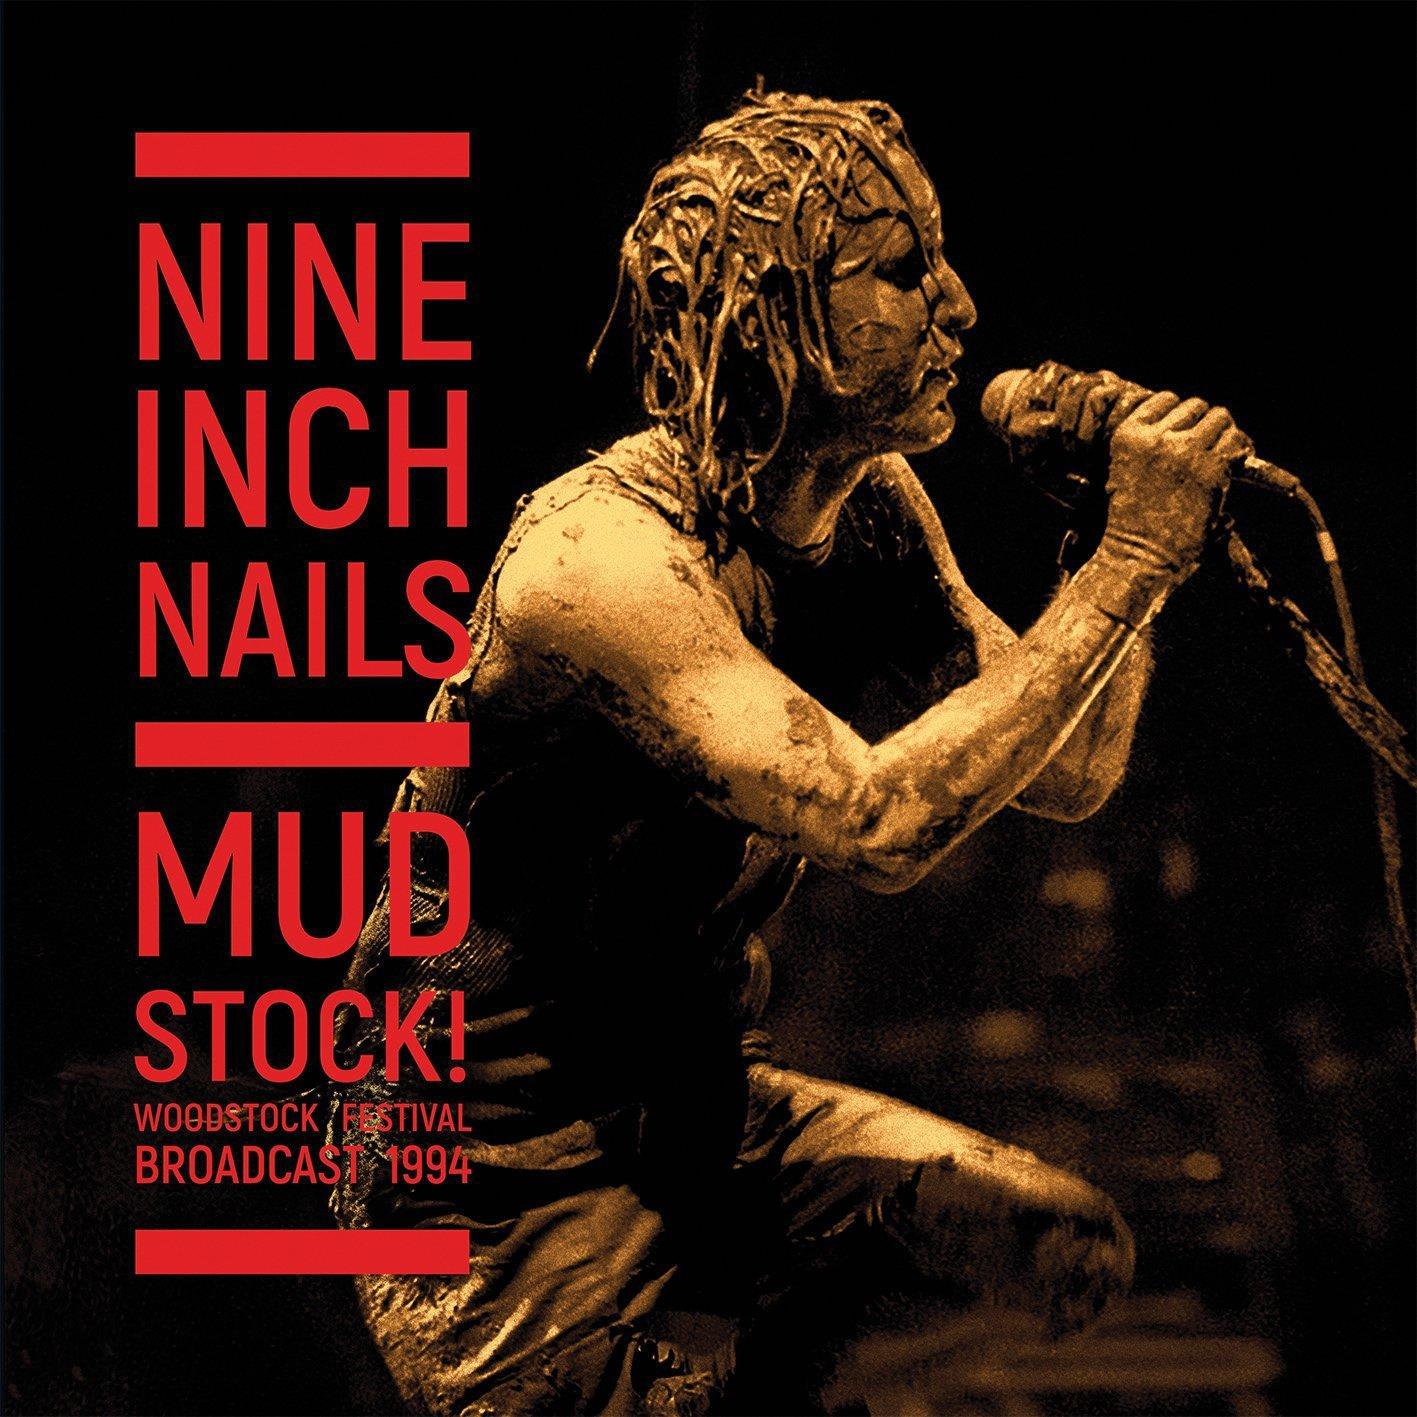 NINE INCH NAILS - Mudstock! (Woodstock 1994) (Clear Vinyl) - Amazon ...